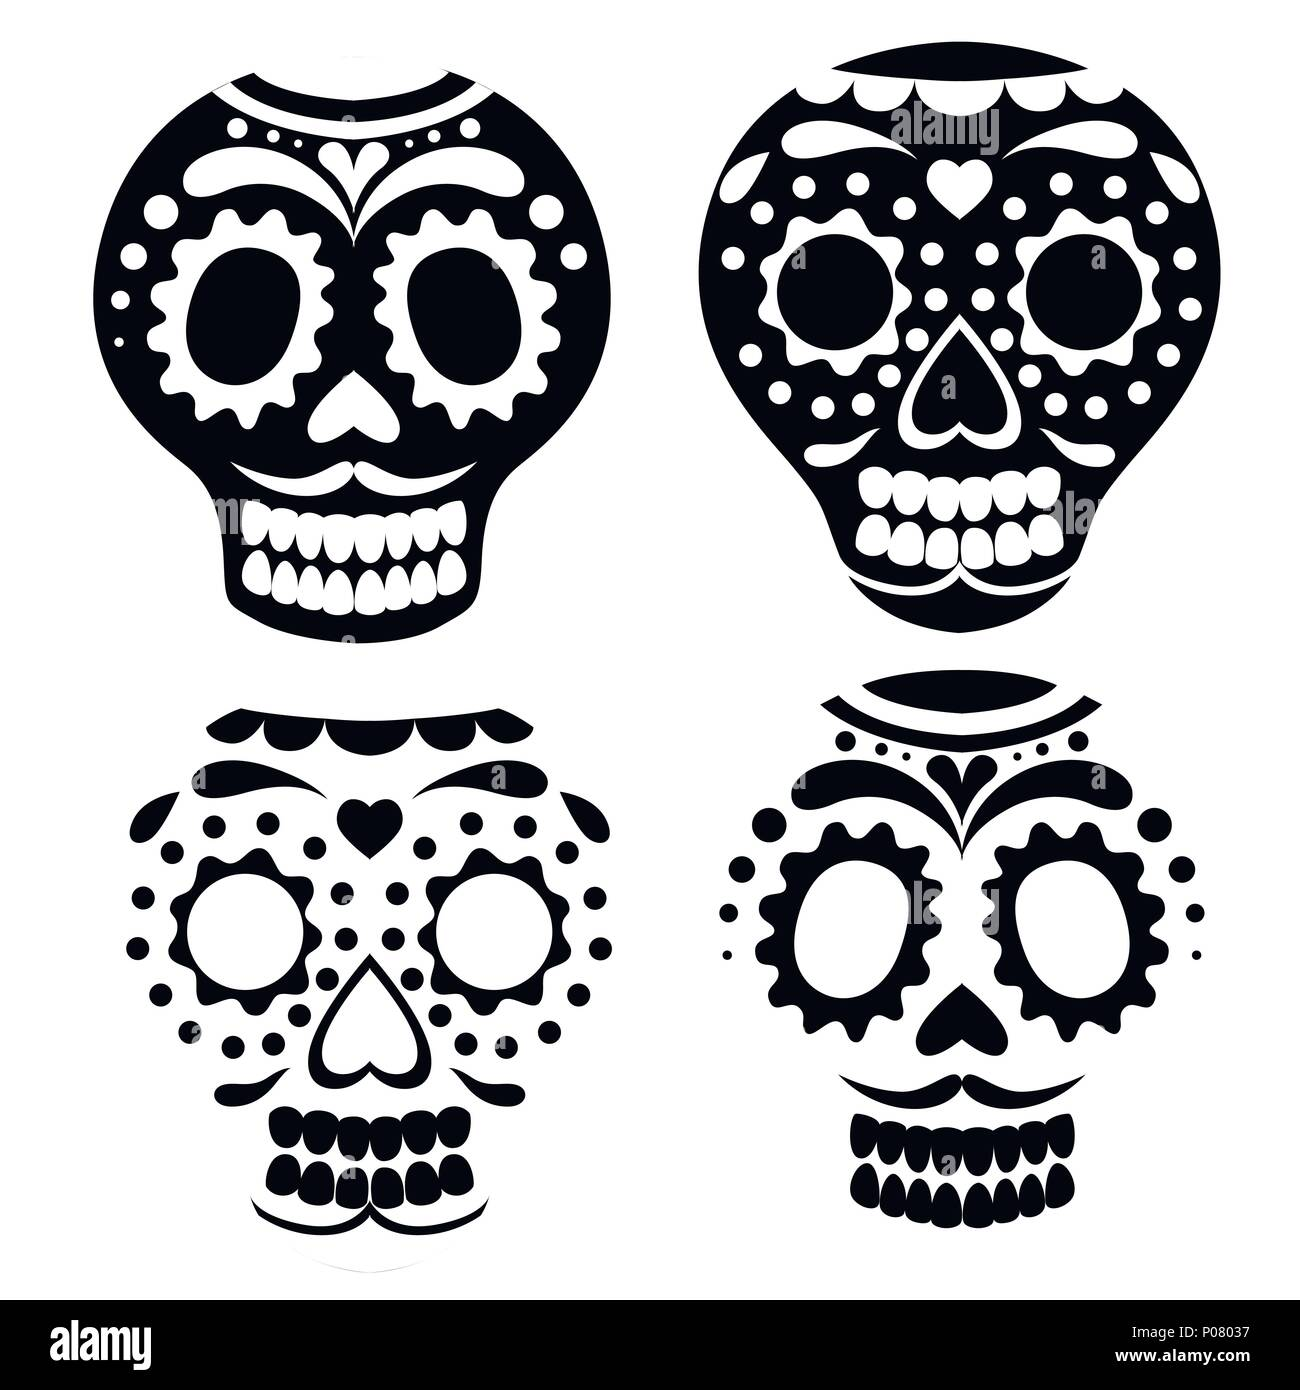 Mexican Folk Mask Imágenes De Stock & Mexican Folk Mask Fotos De ...